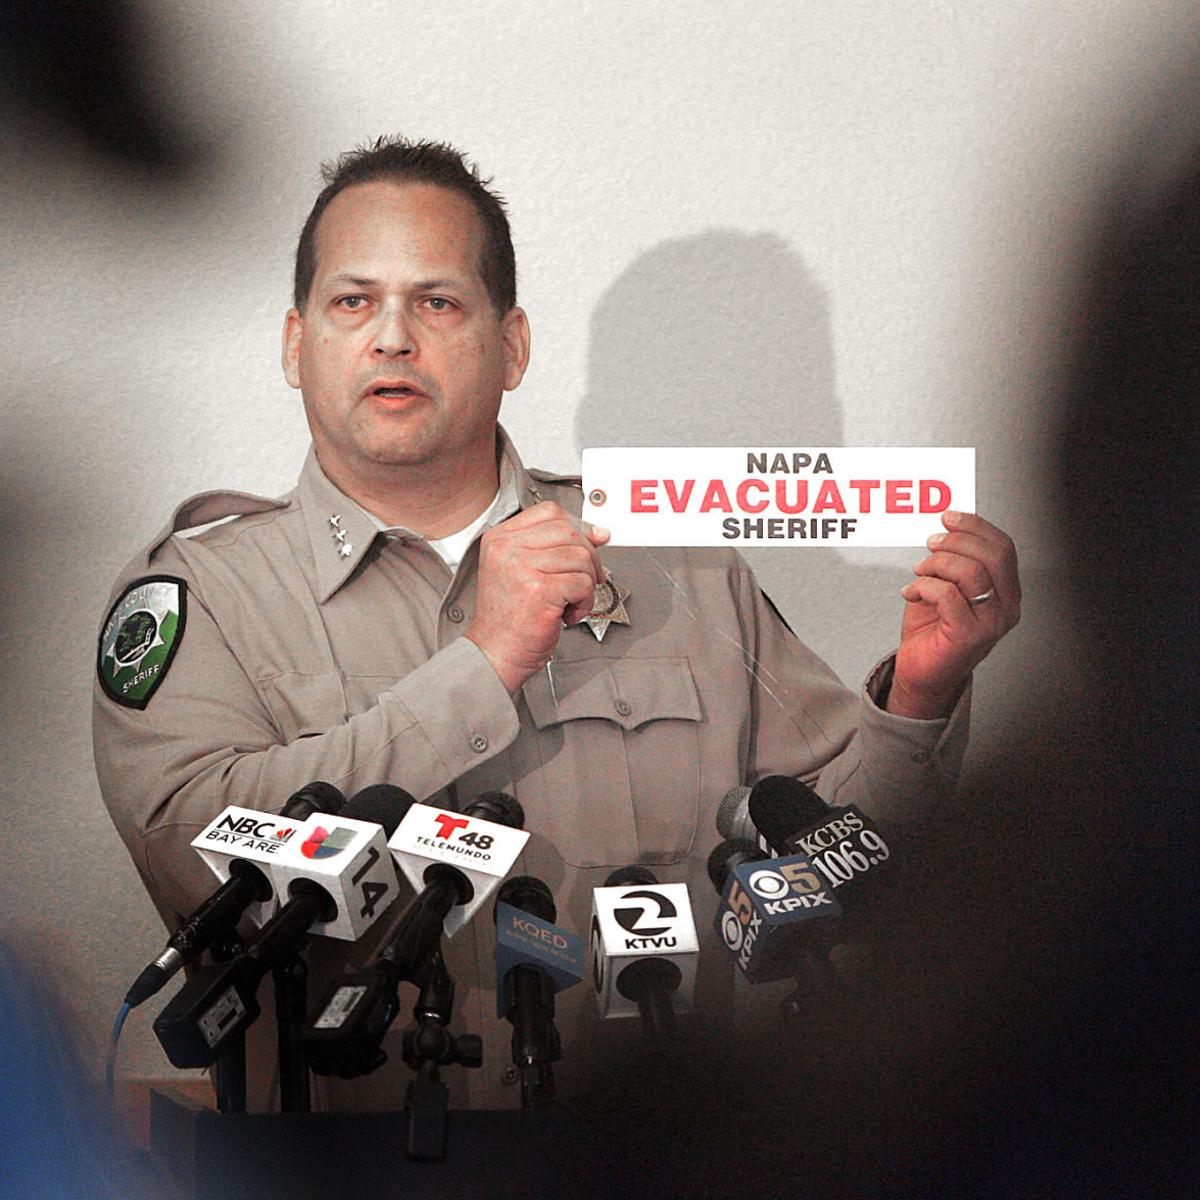 Napa Sheriff's Office demonstrates new disaster communication steps